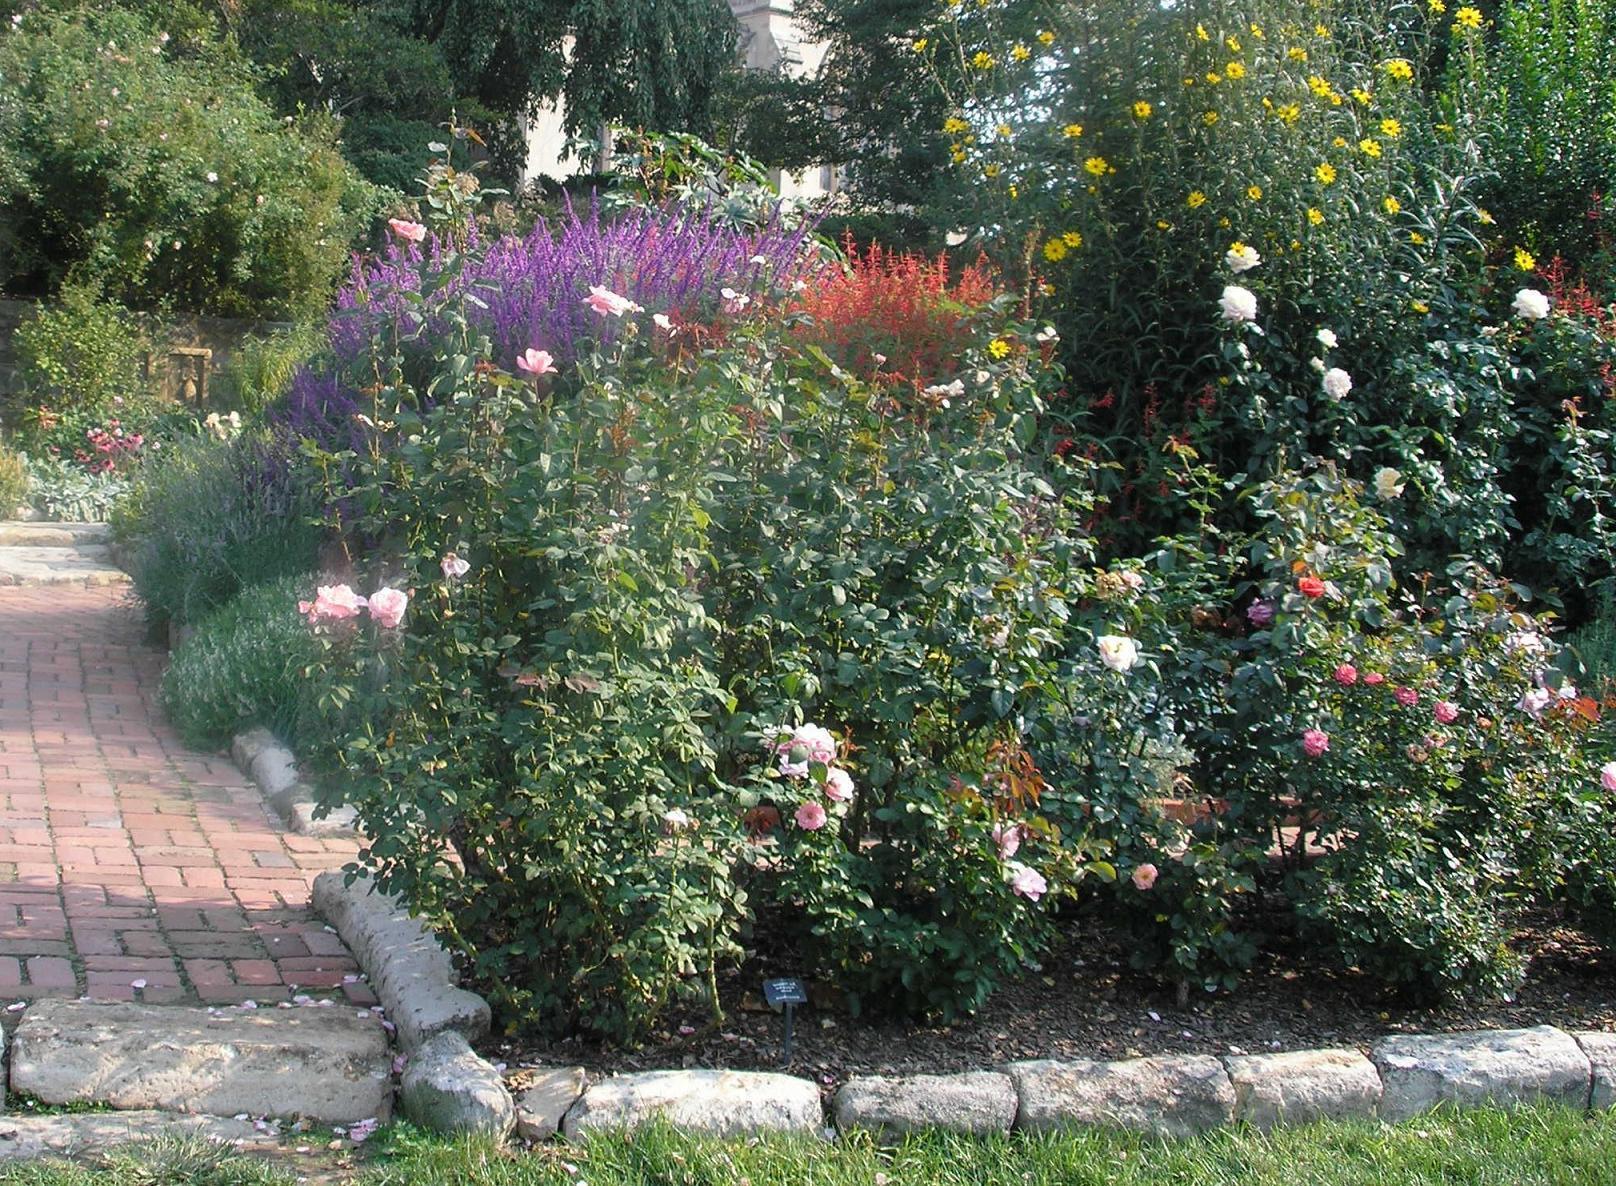 Bordure Jardin : Installer Des Bordures De Jardin | Pratique.fr dedans Bordure De Jardin En Pierre